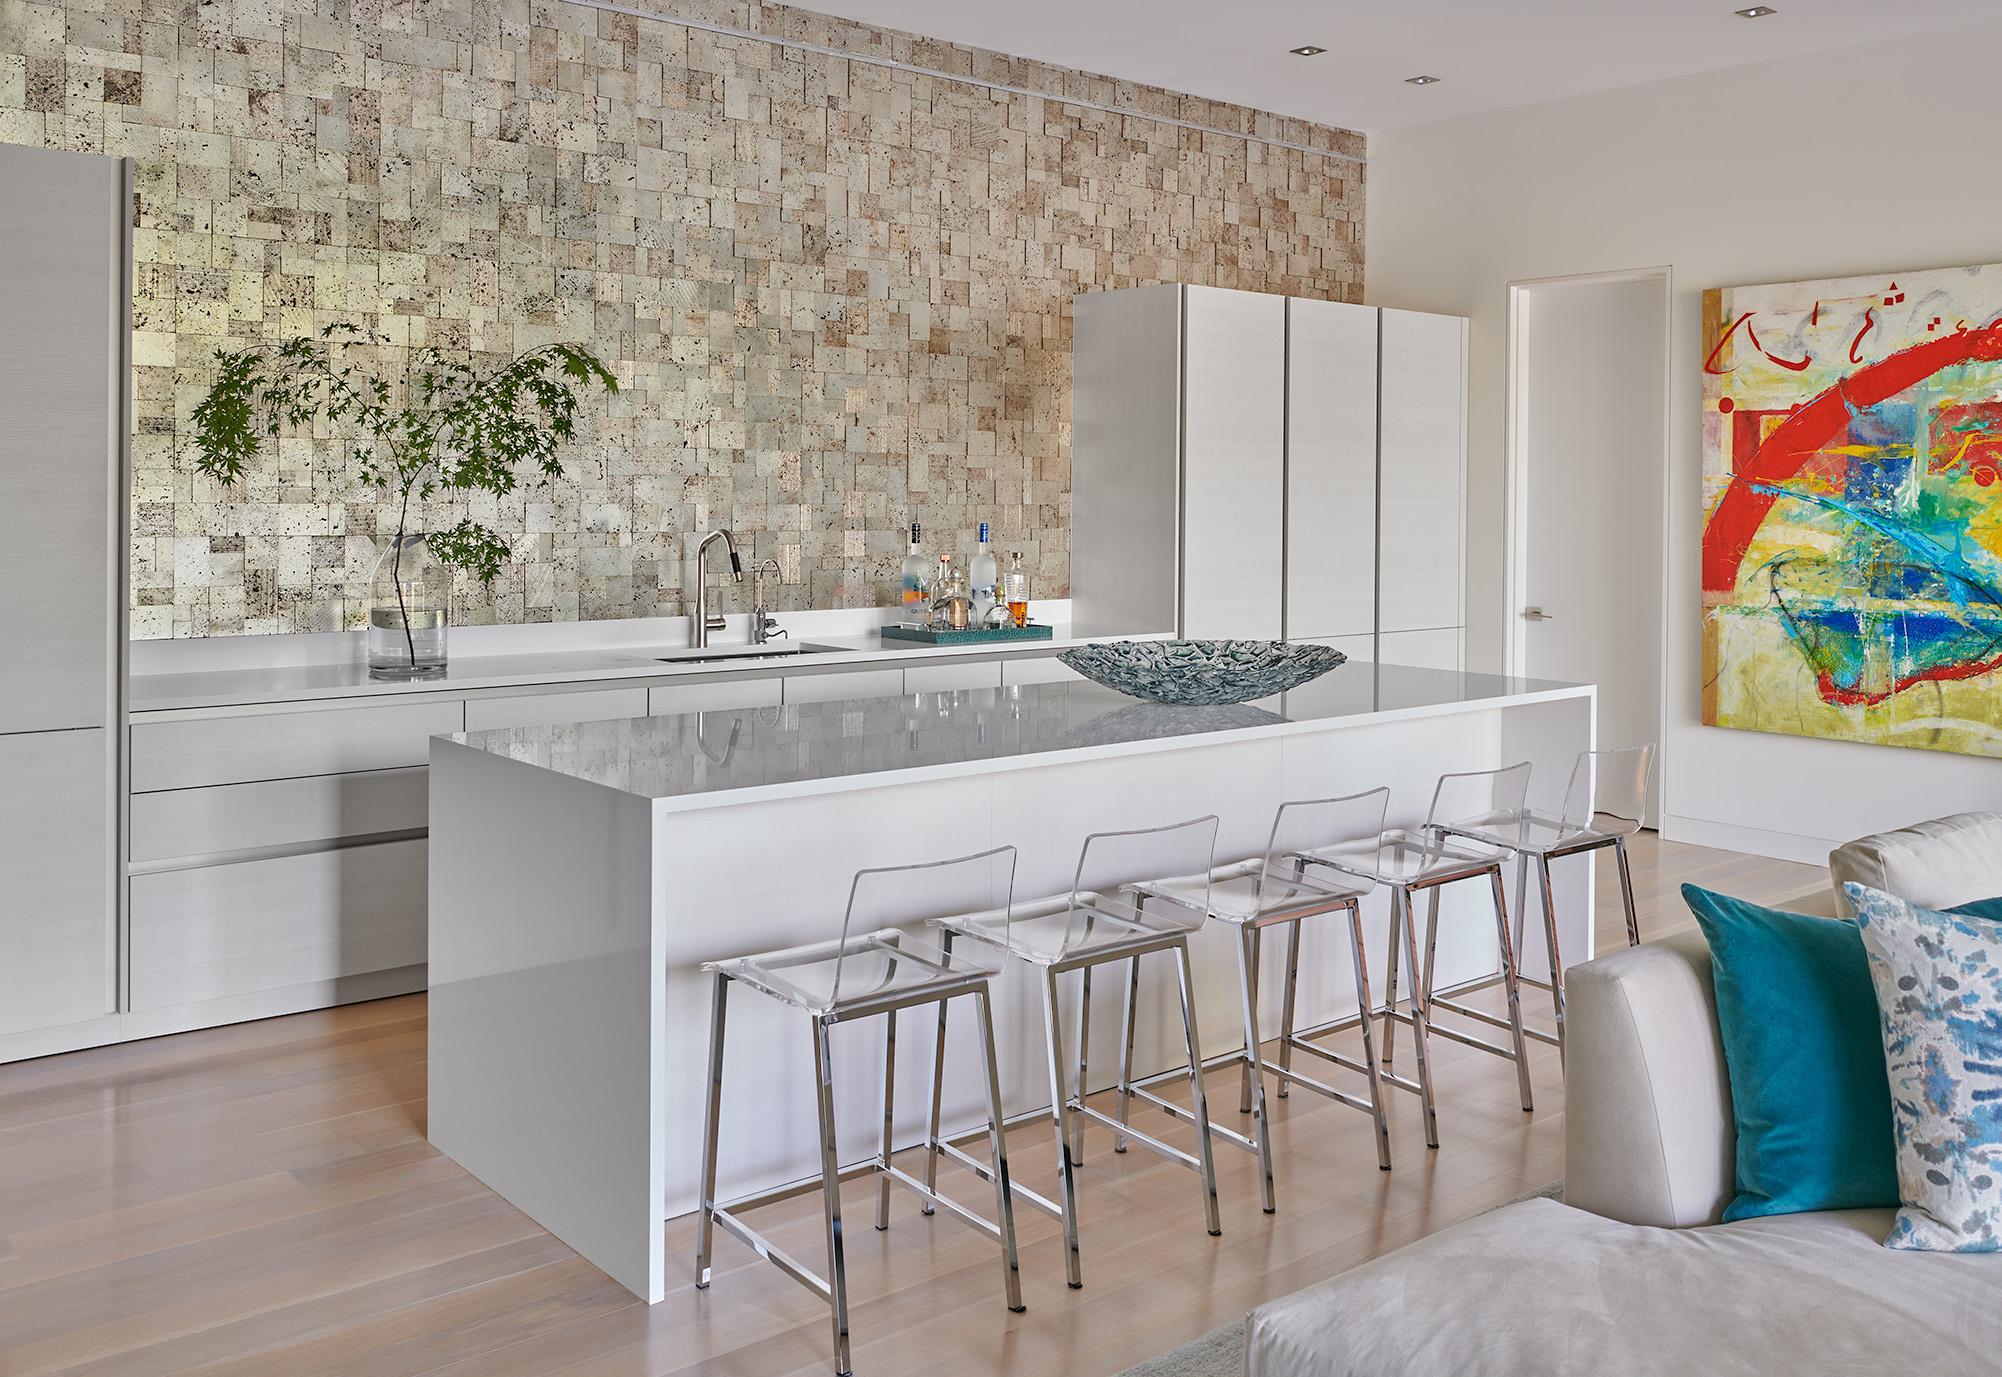 Brilliant Luxury Kitchen Design Remodeling In Washington D C Home Interior And Landscaping Fragforummapetitesourisinfo